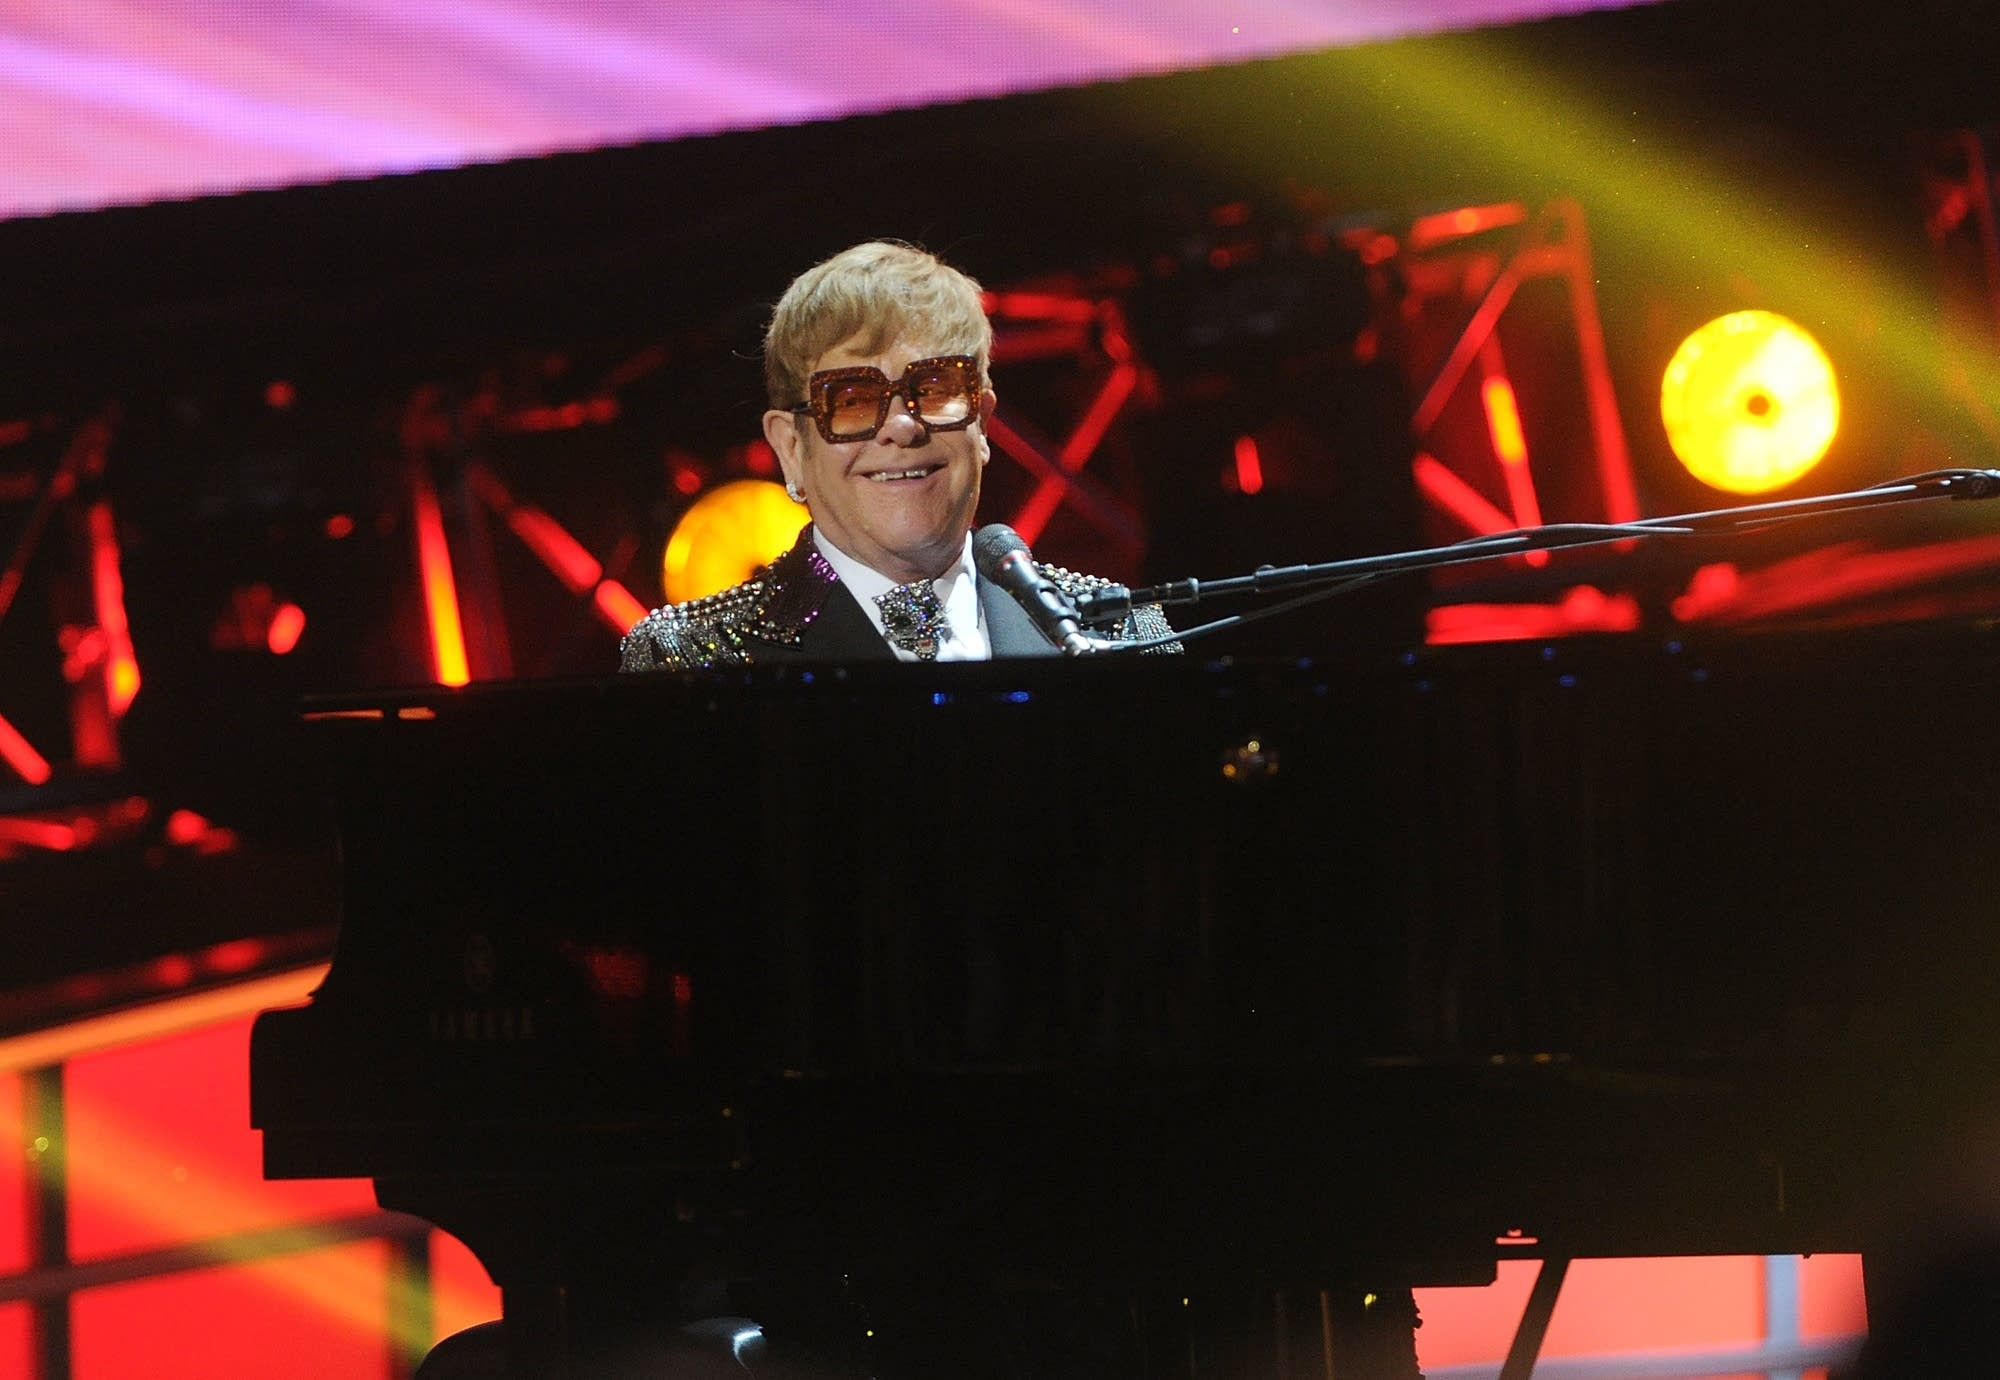 Elton John onstage